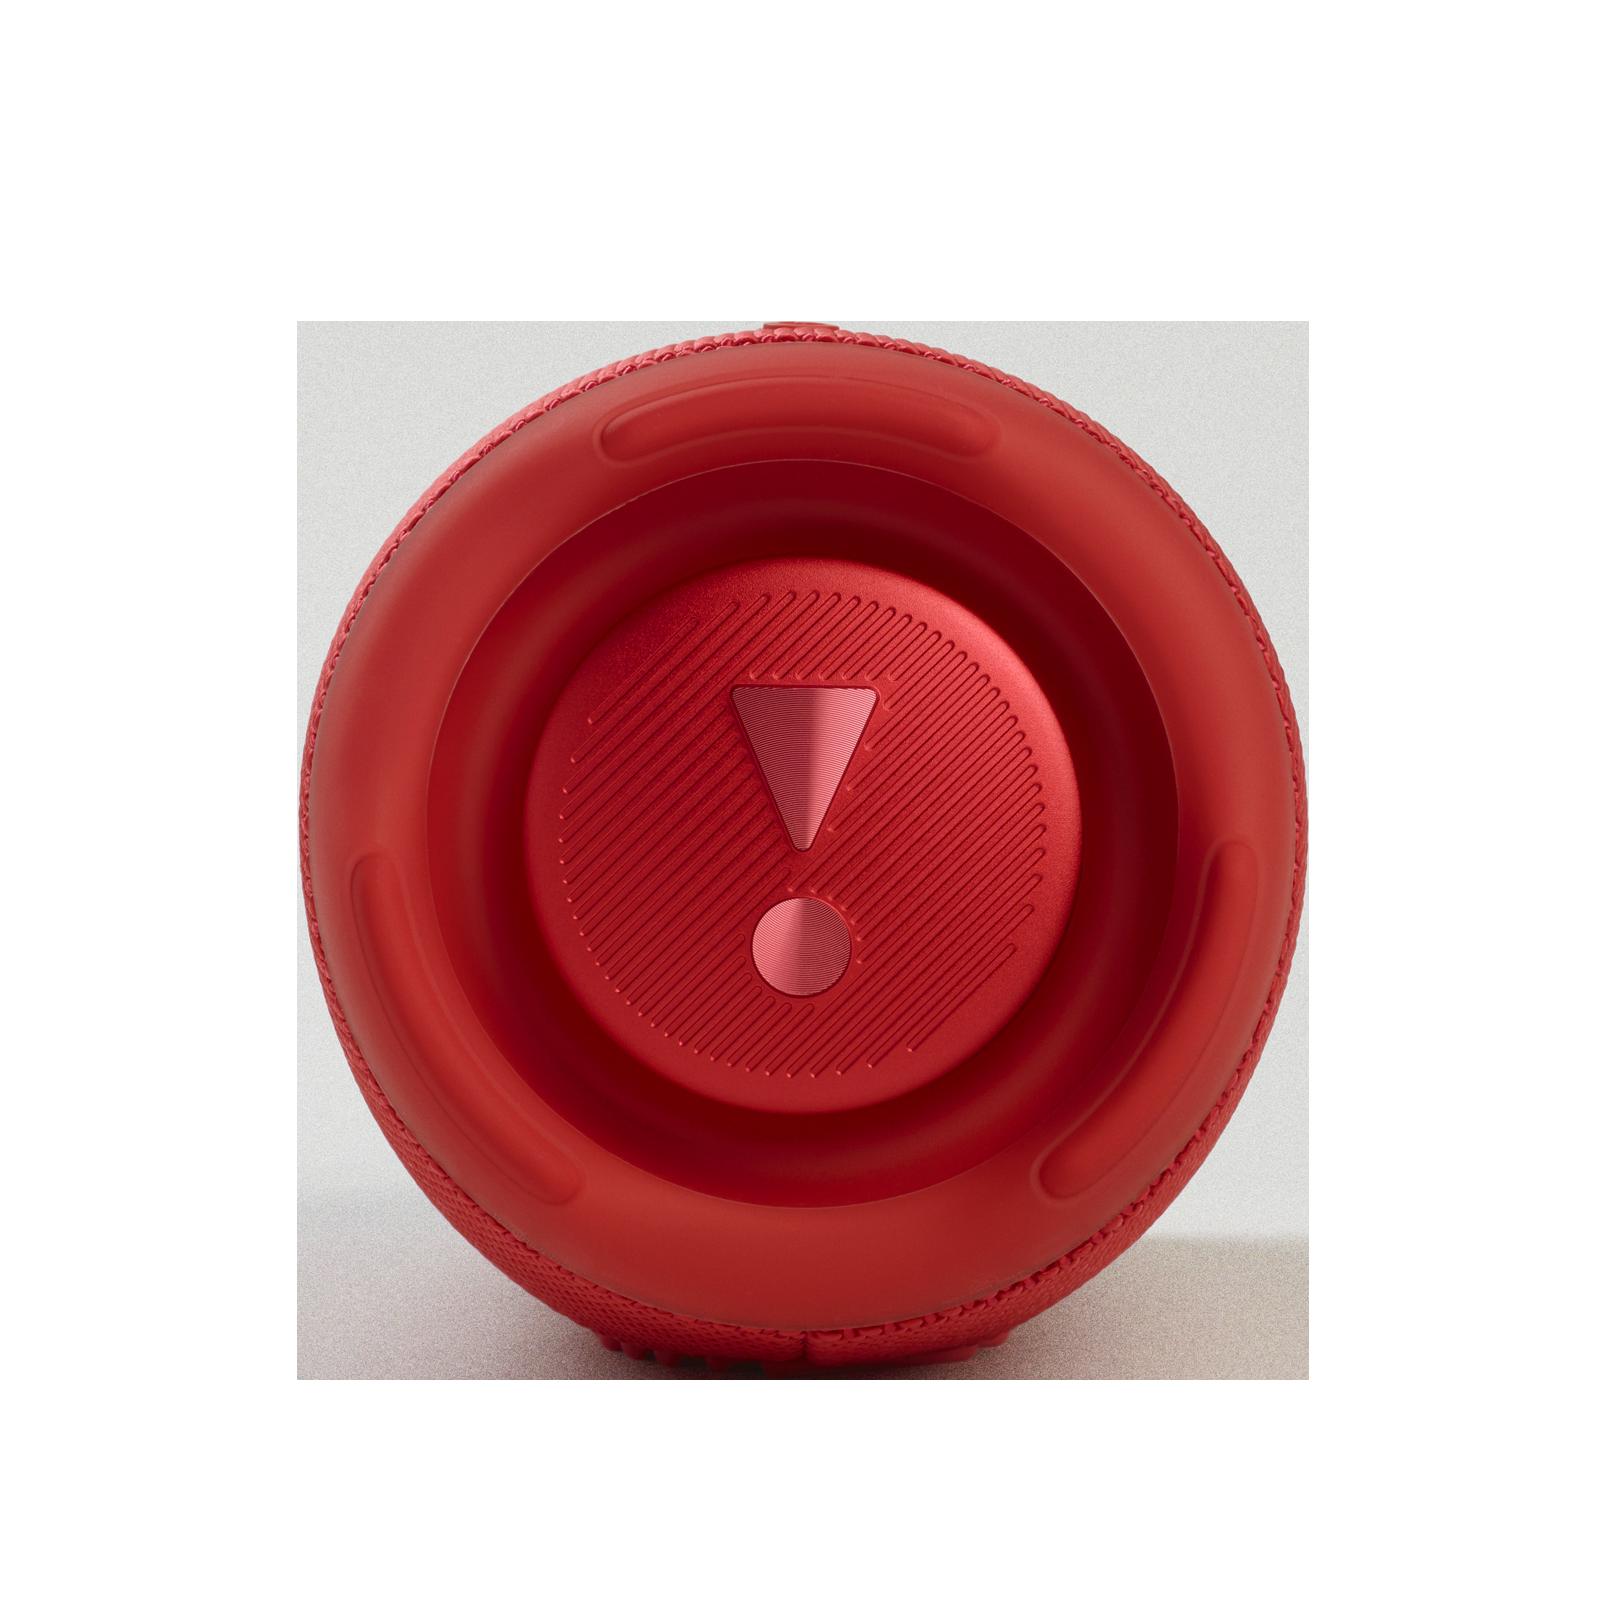 JBL Charge 5 - Red - Portable Waterproof Speaker with Powerbank - Left